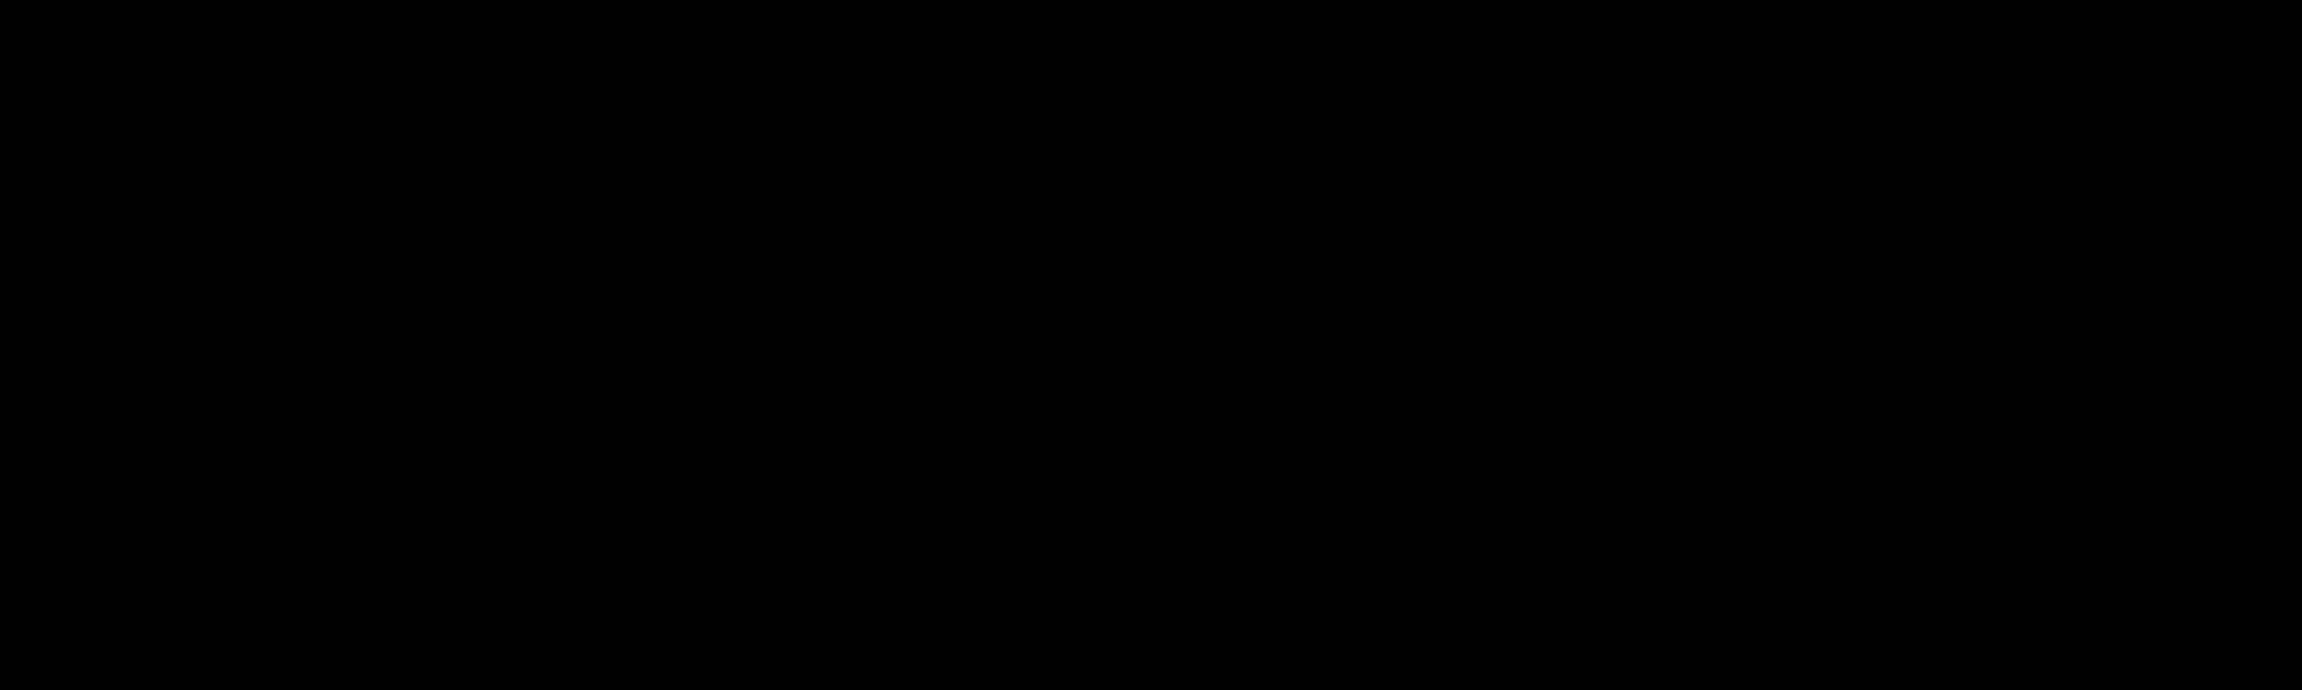 Aripiprazole-d<sub>8</sub> EP impurity D (piperazine-d<sub>8</sub>)